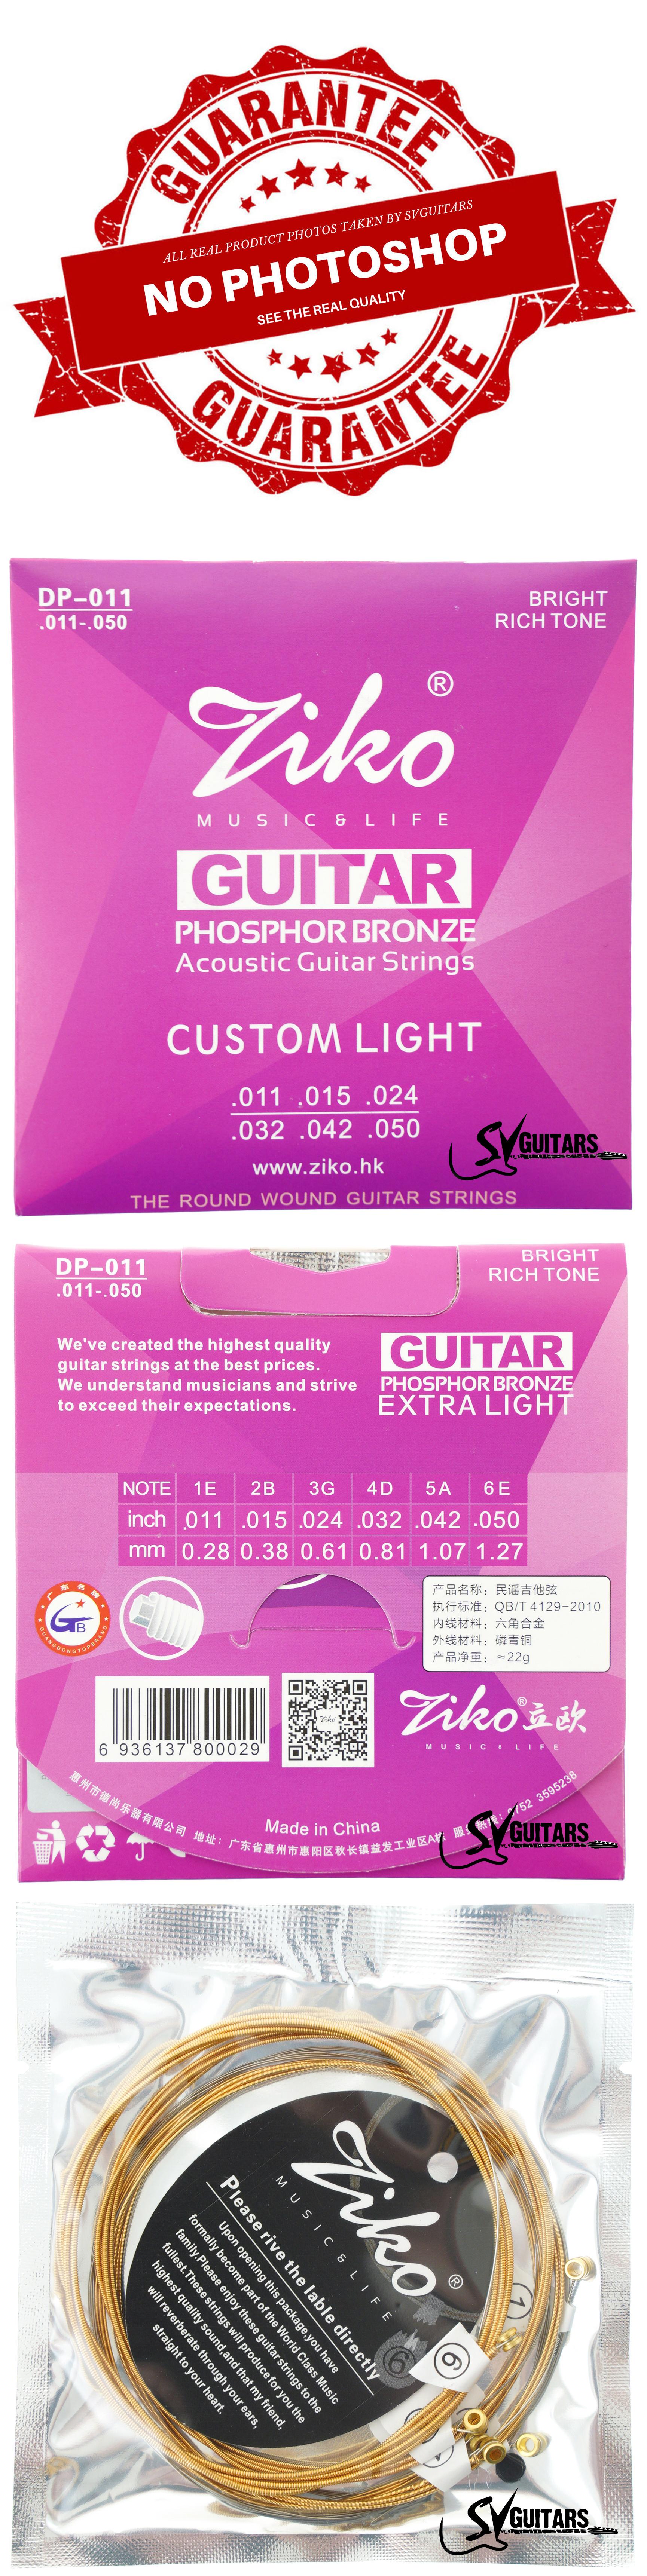 ziko-dp-011-11-50-phosphor-bronze-acoustic-guitar-strings-content.jpg